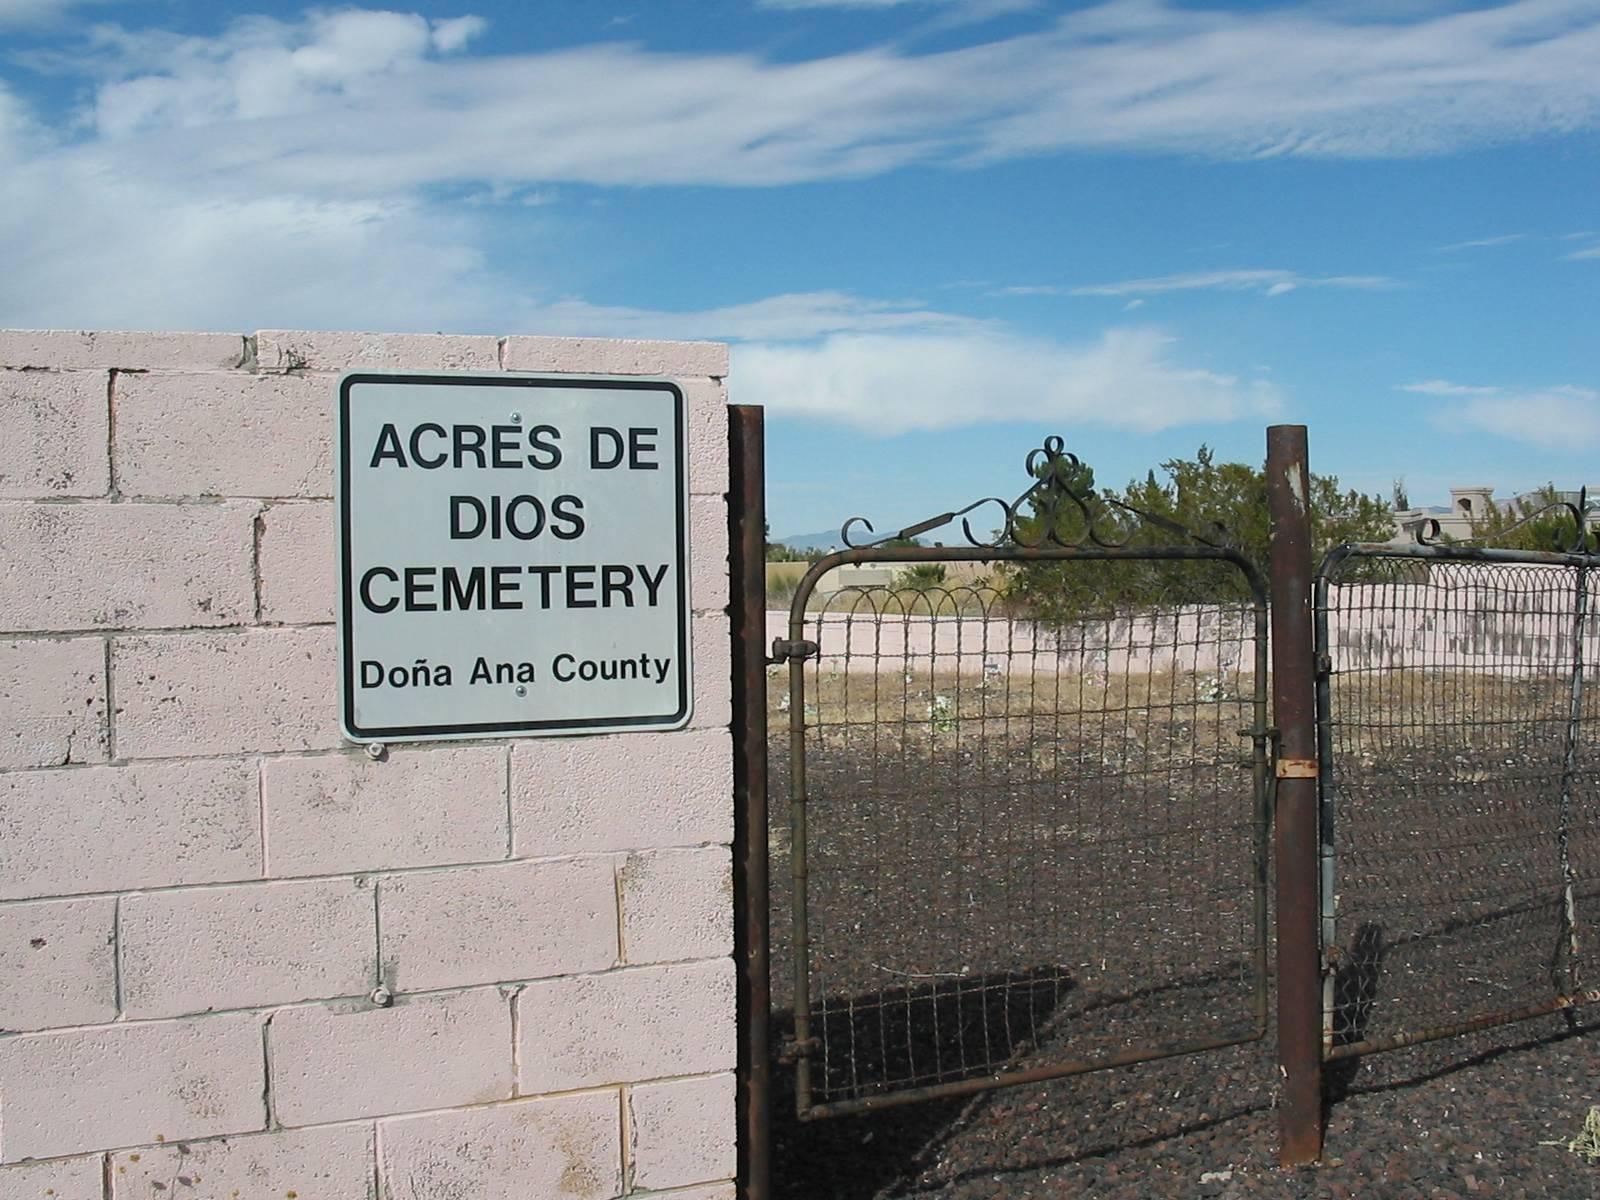 Acres De Dios Pauper Cemetery, Las Cruces, Dona Ana County, New Mexico